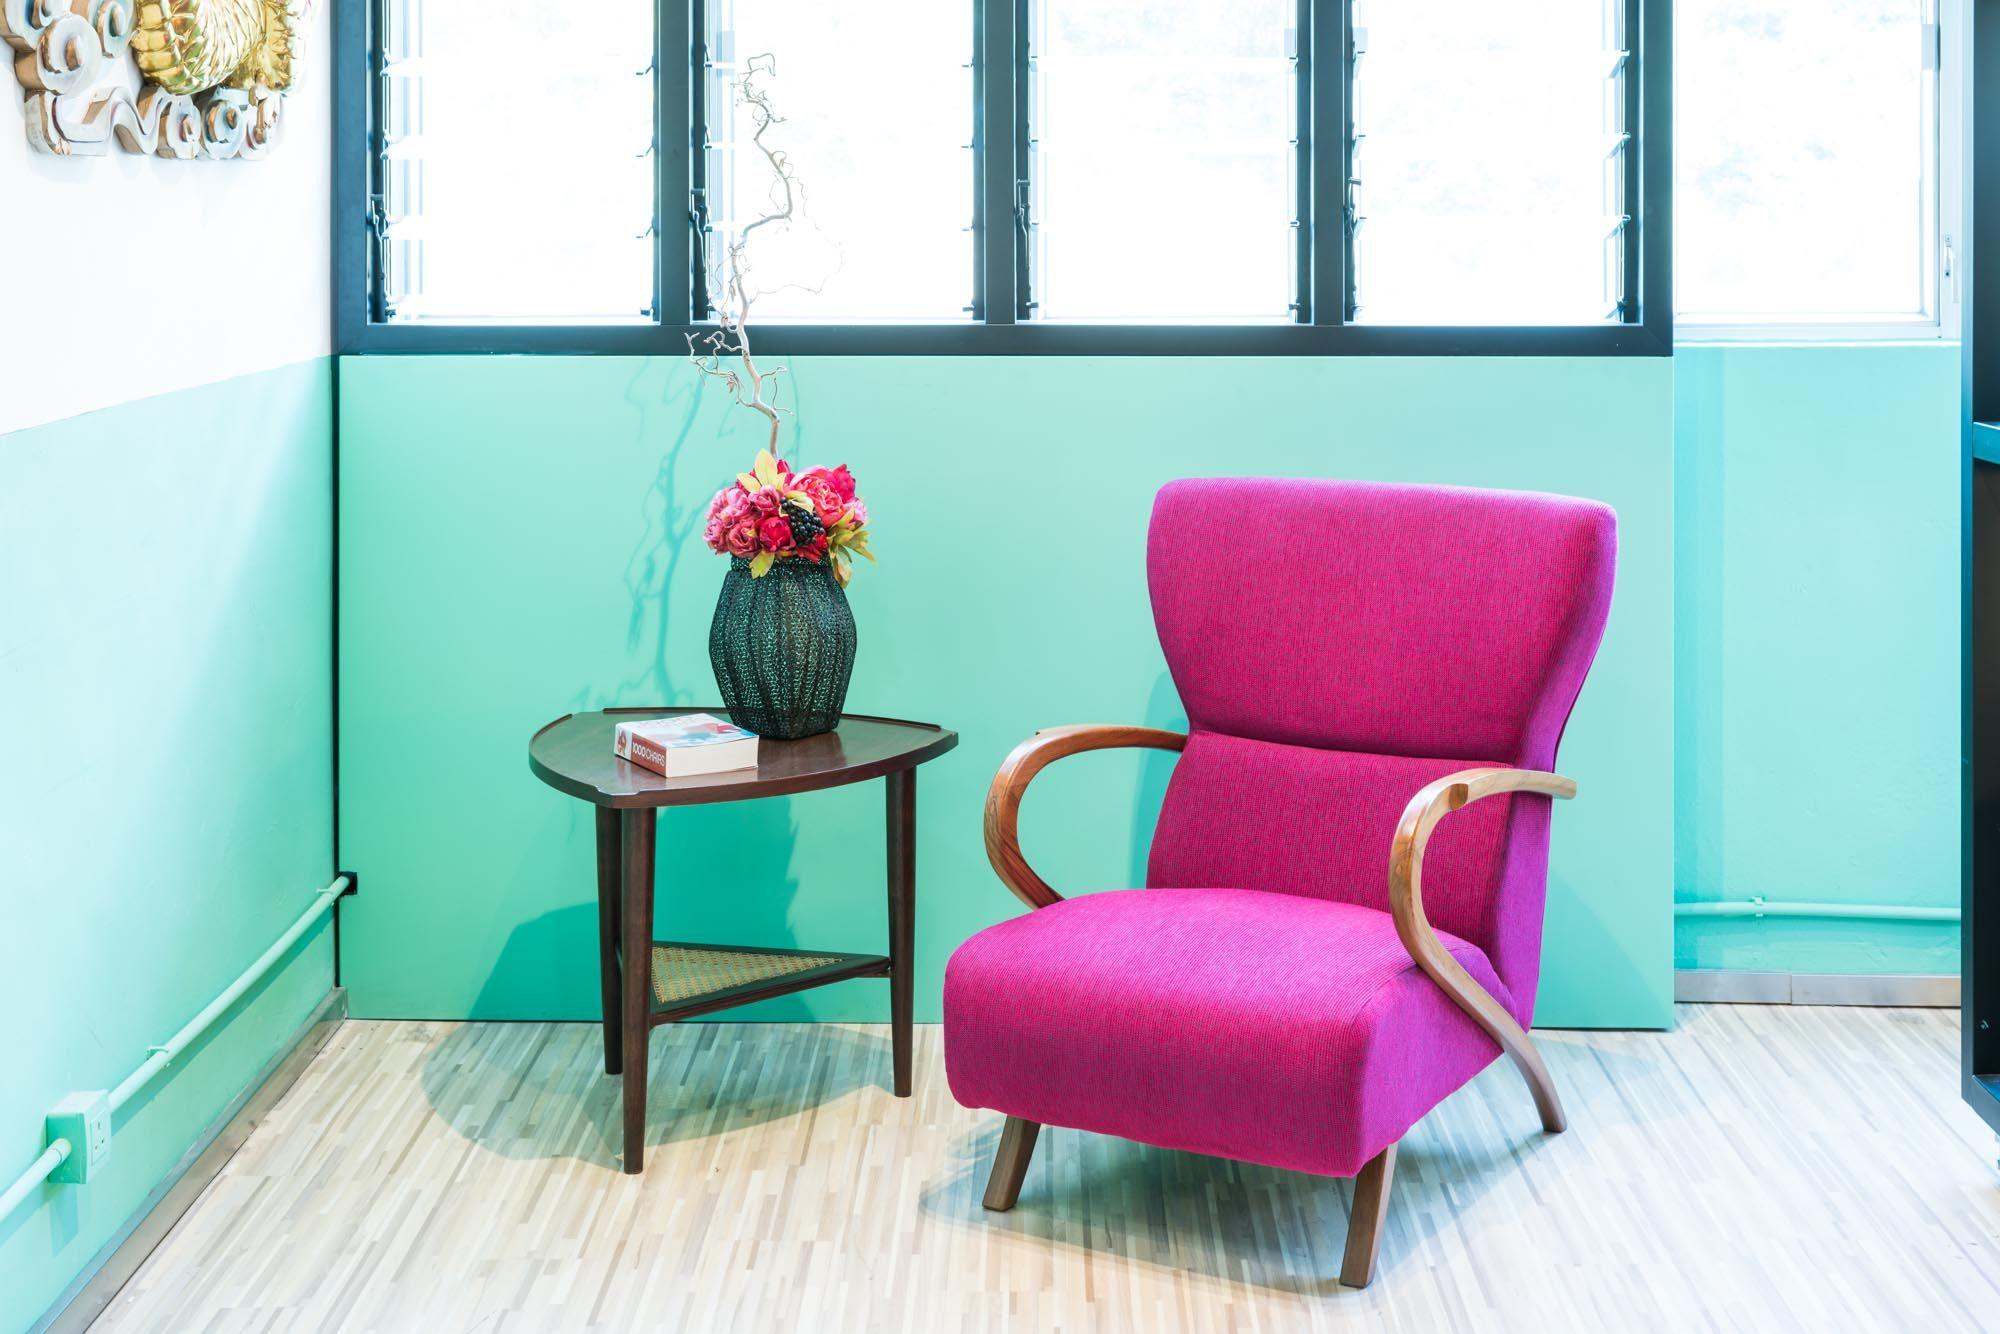 Stsp0024 | Comfortable armchair, Home decor, Decor